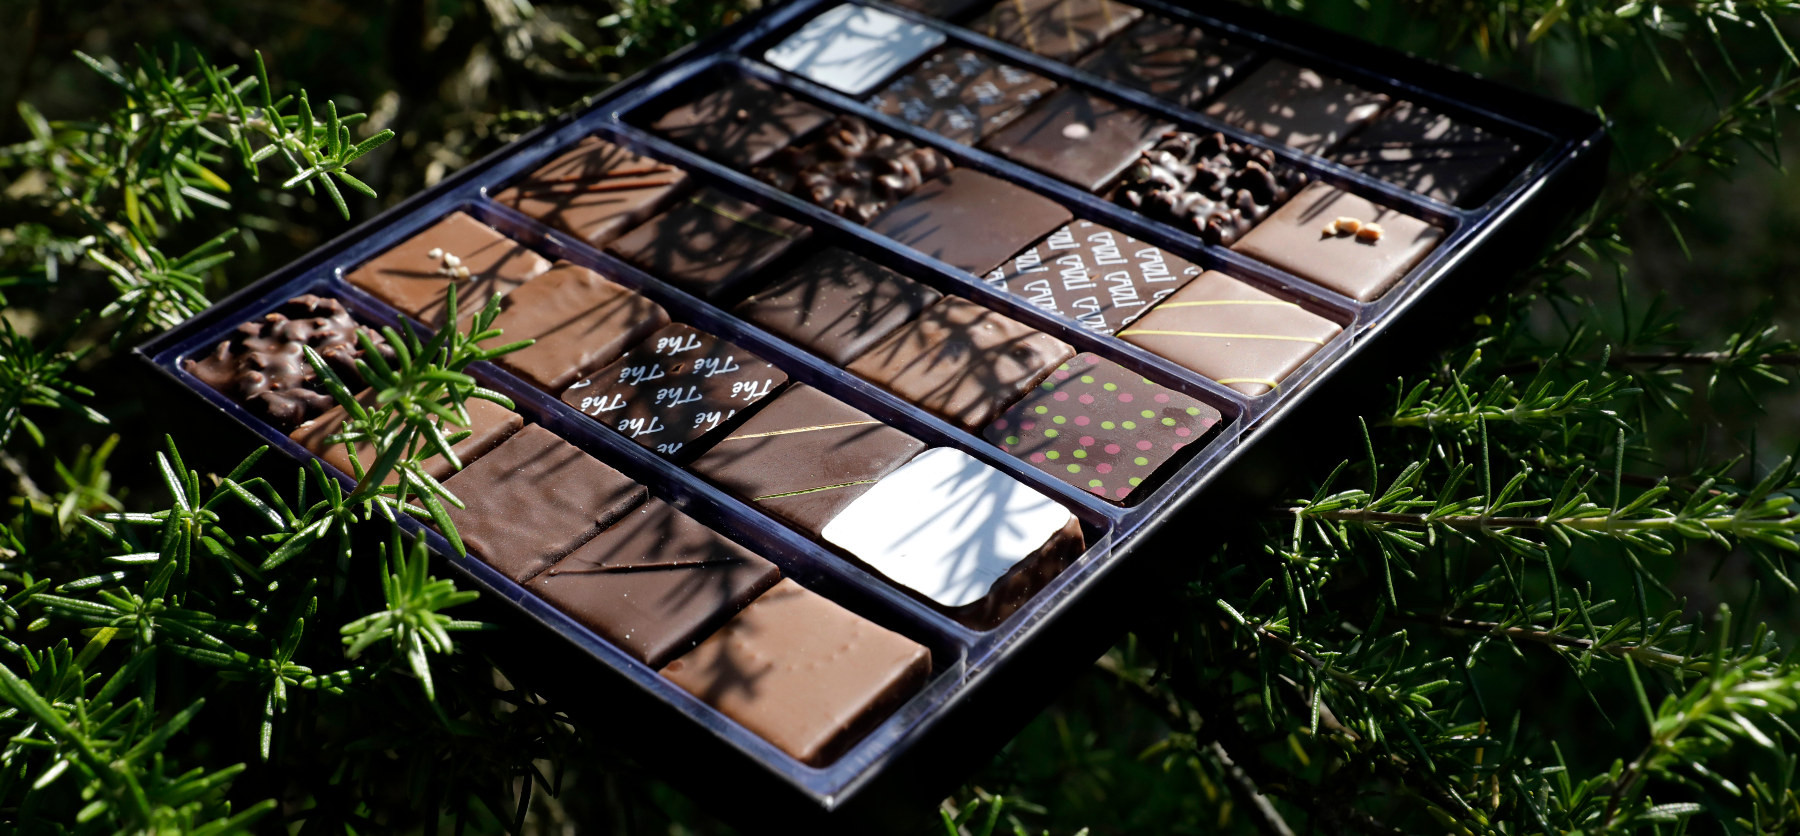 Abonnement Box Chocolat